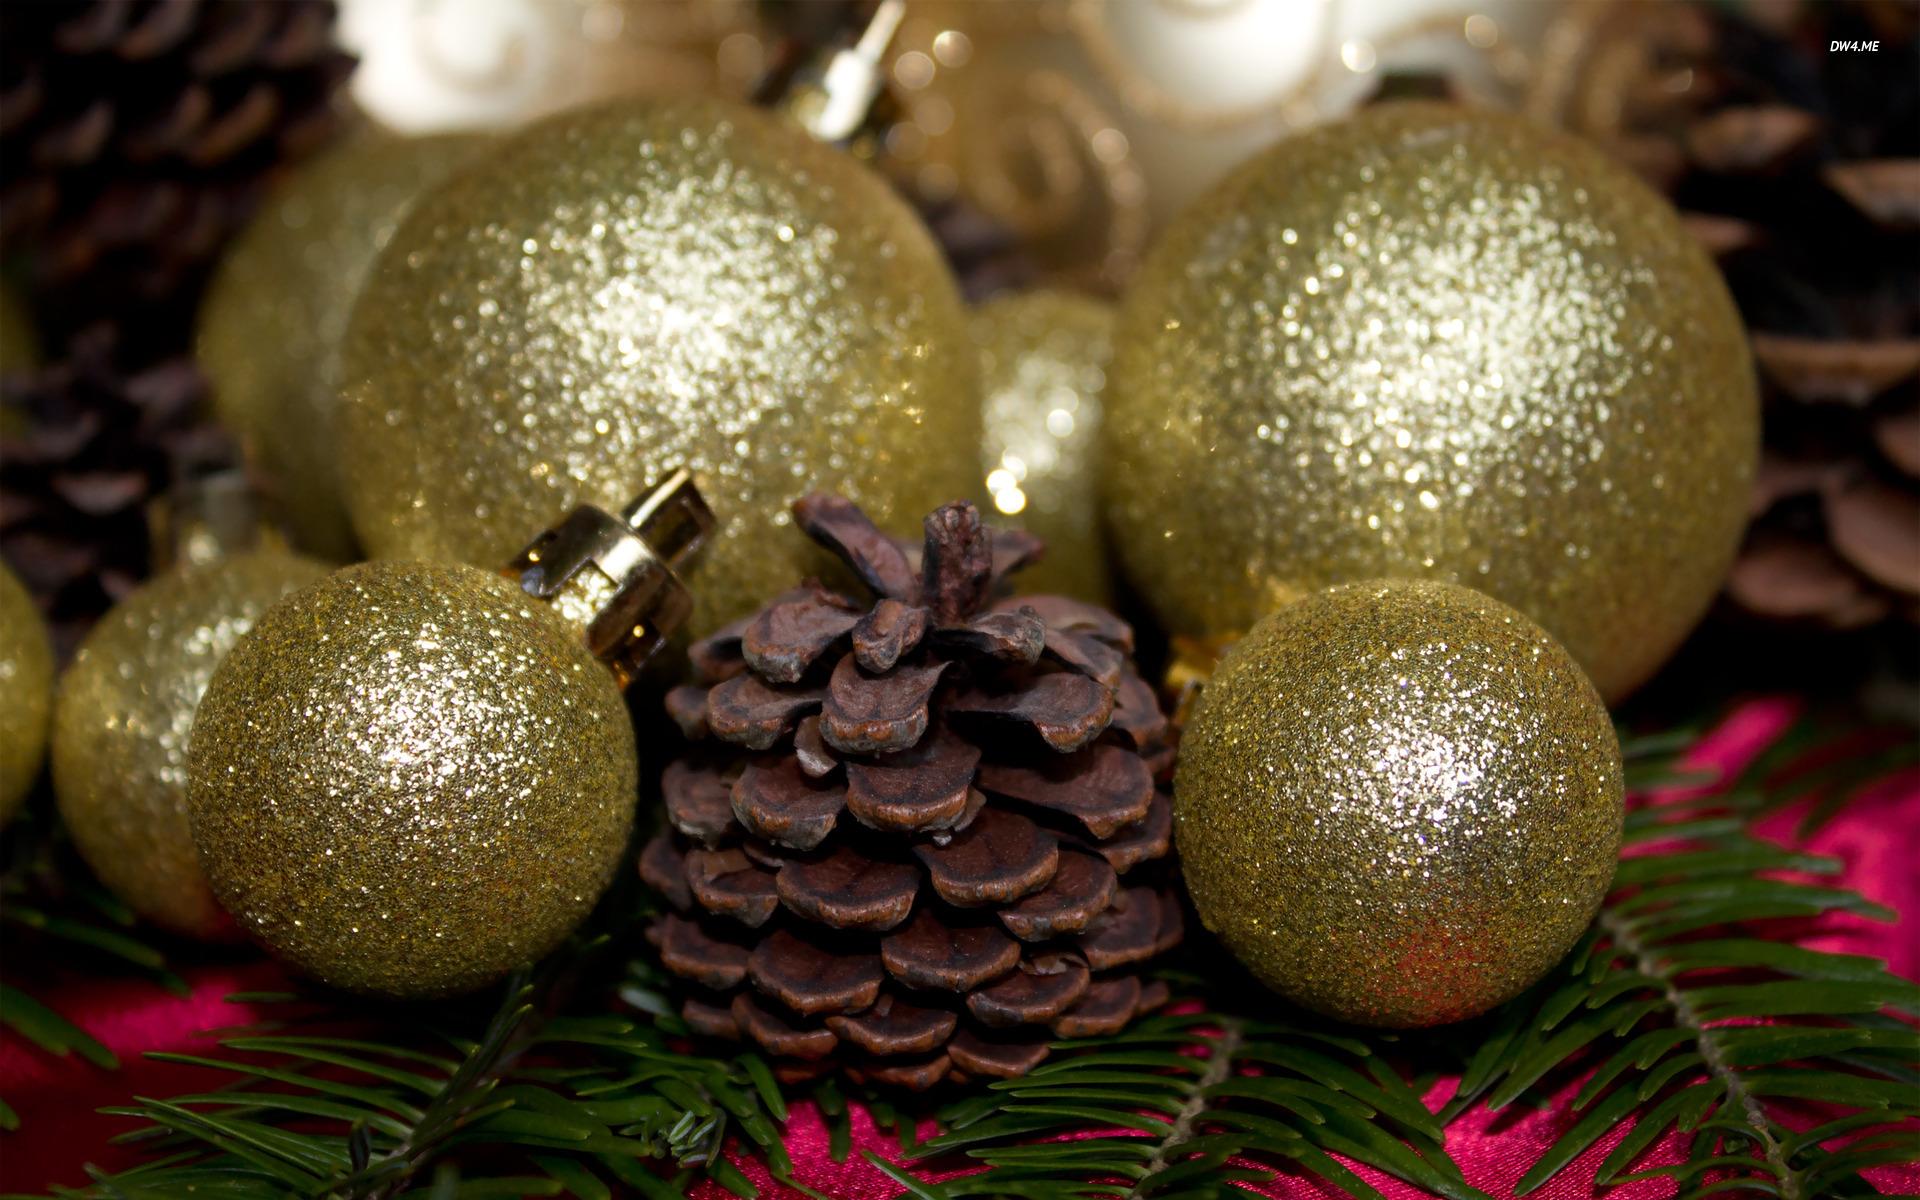 1034-christmas-ornaments-1920x1200-photography-wallpaper